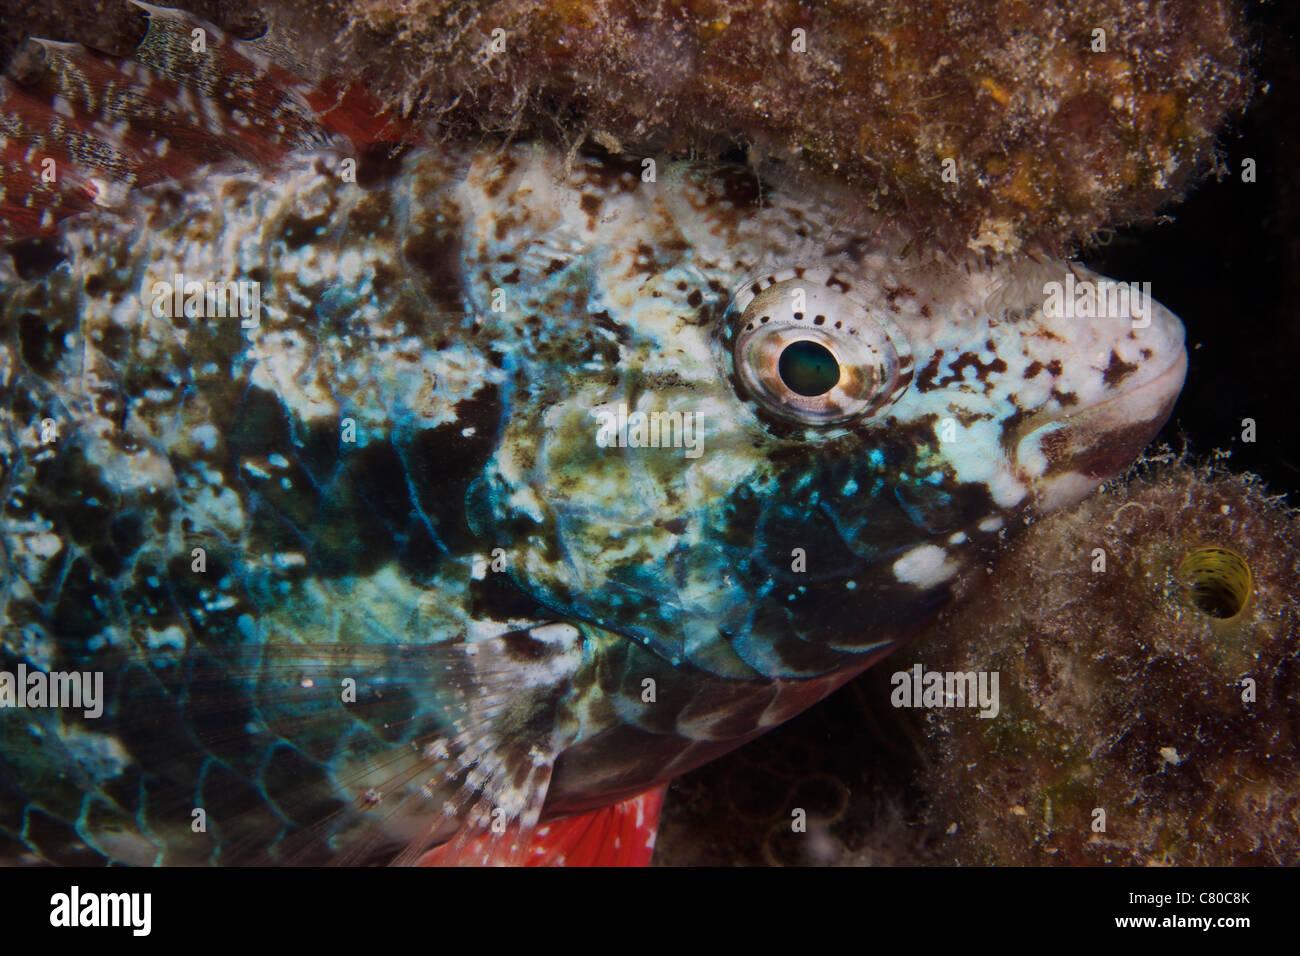 Stoplight parrotfish sleeping at night, Bonaire, Caribbean Netherlands. - Stock Image